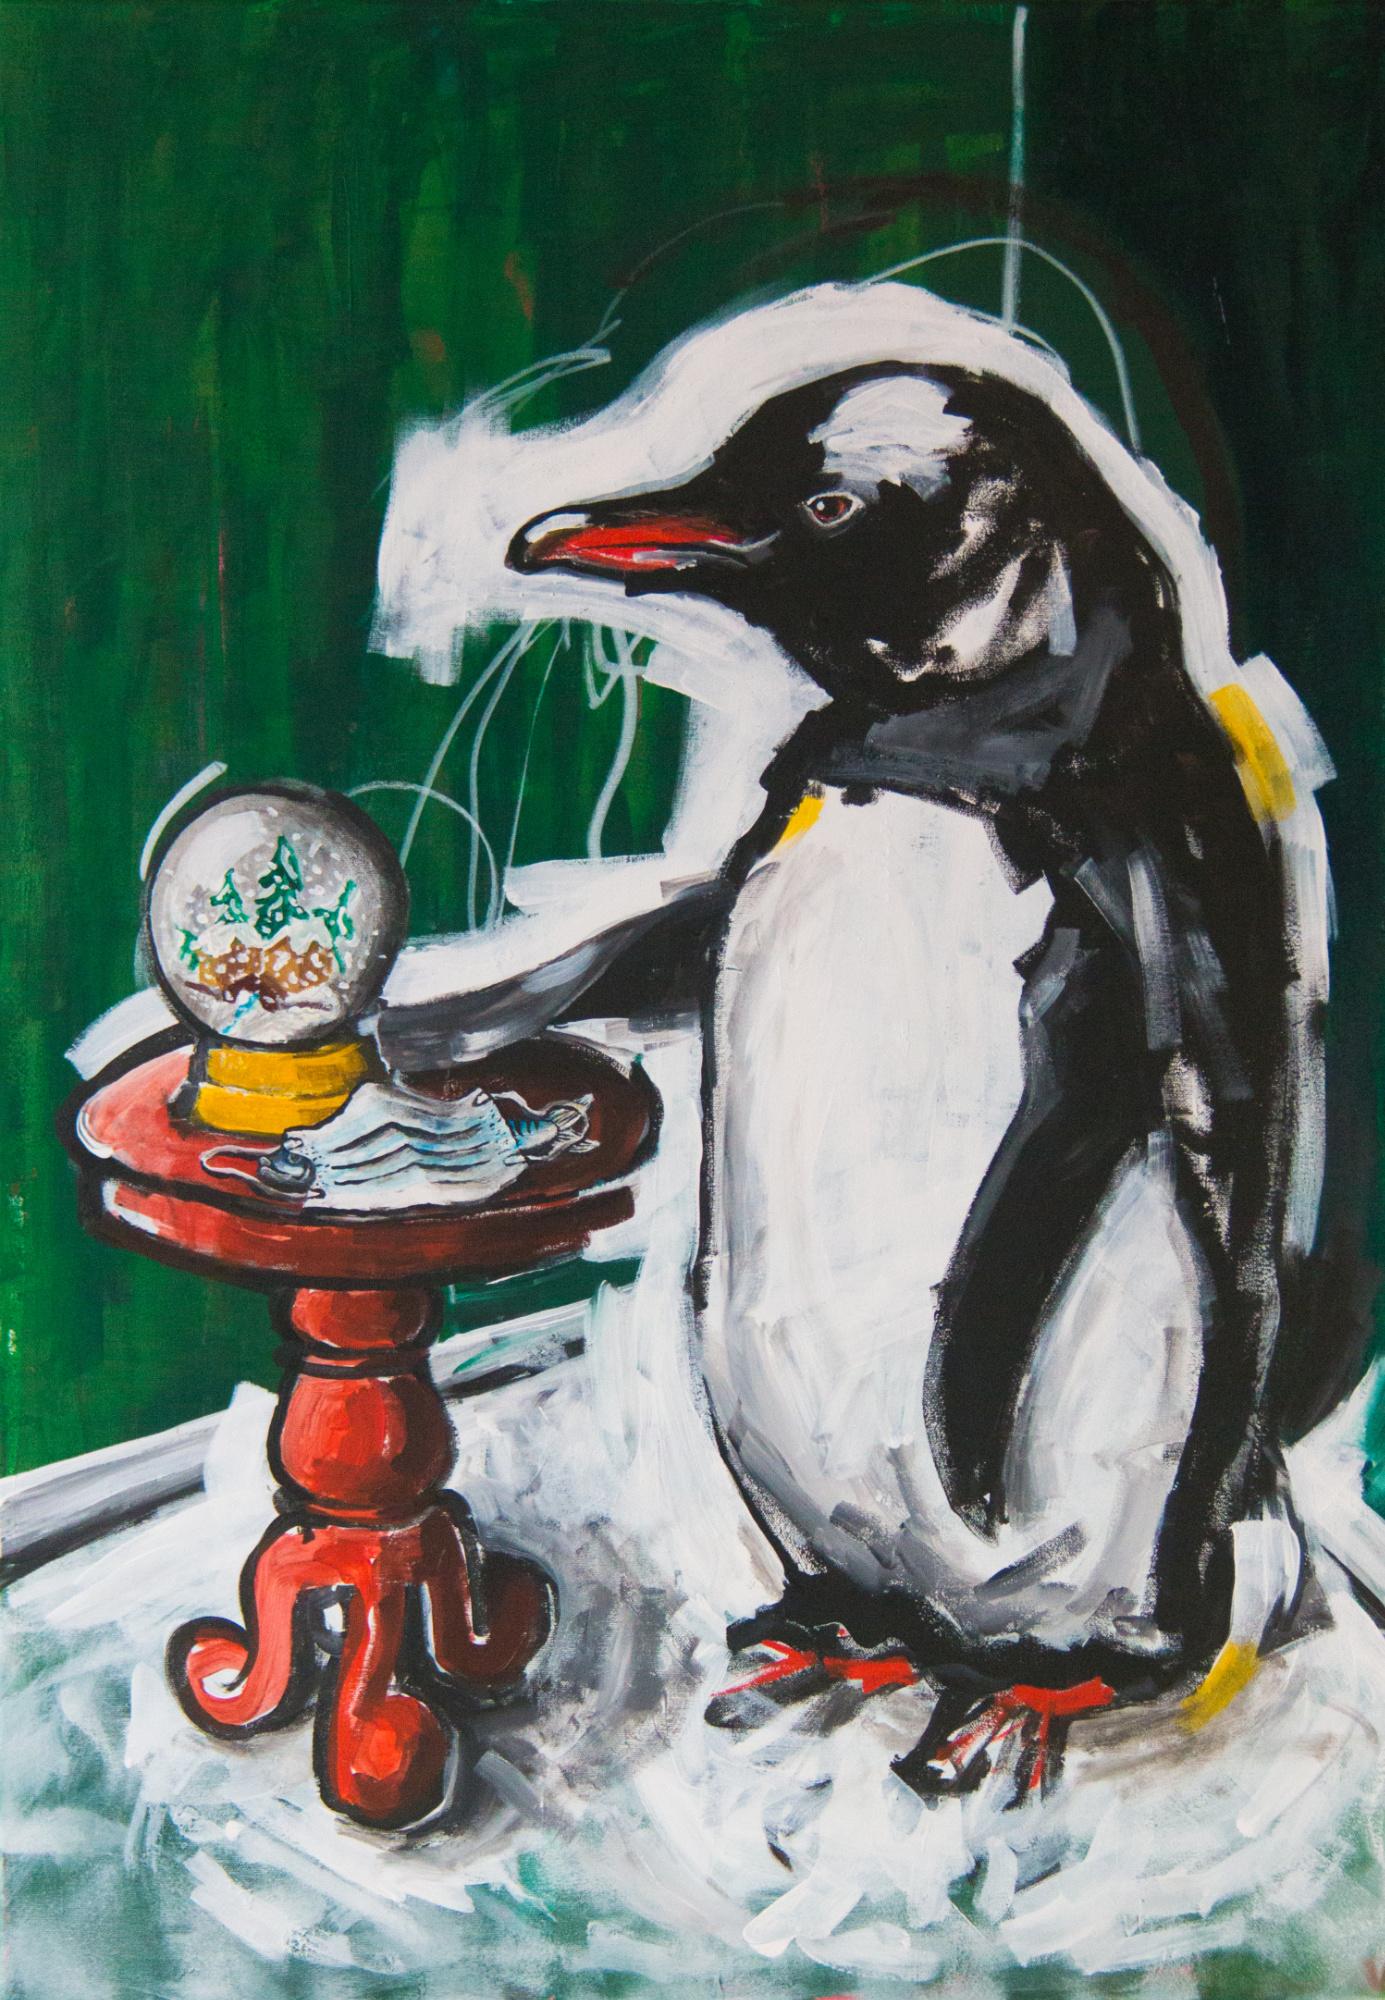 Der Pinguin, 70x100cm, Marc Allgaier, 2020